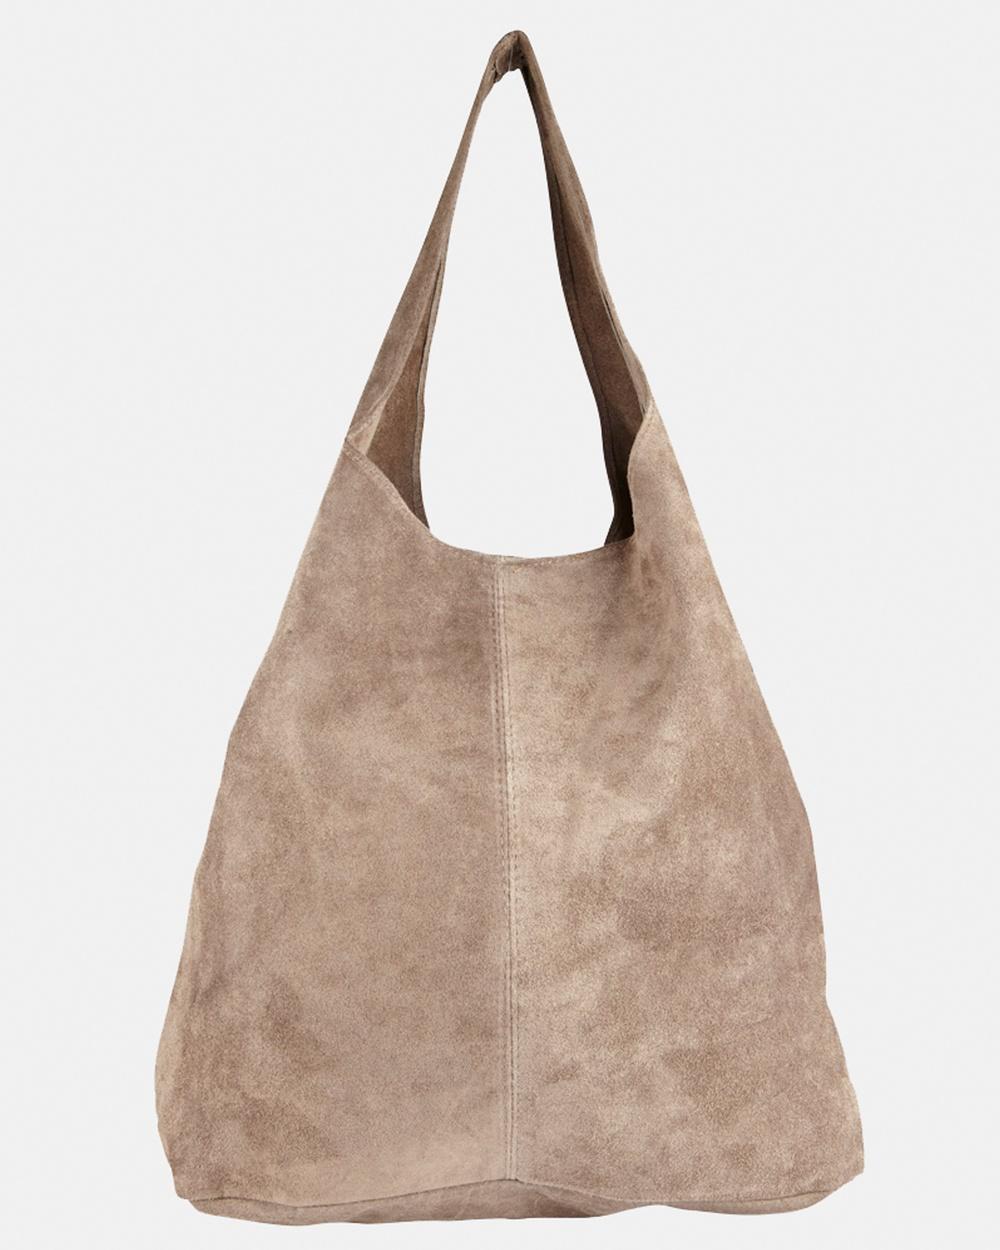 Marlafiji Wendy Hobo Beach Bags Taupe Leather bags Australia